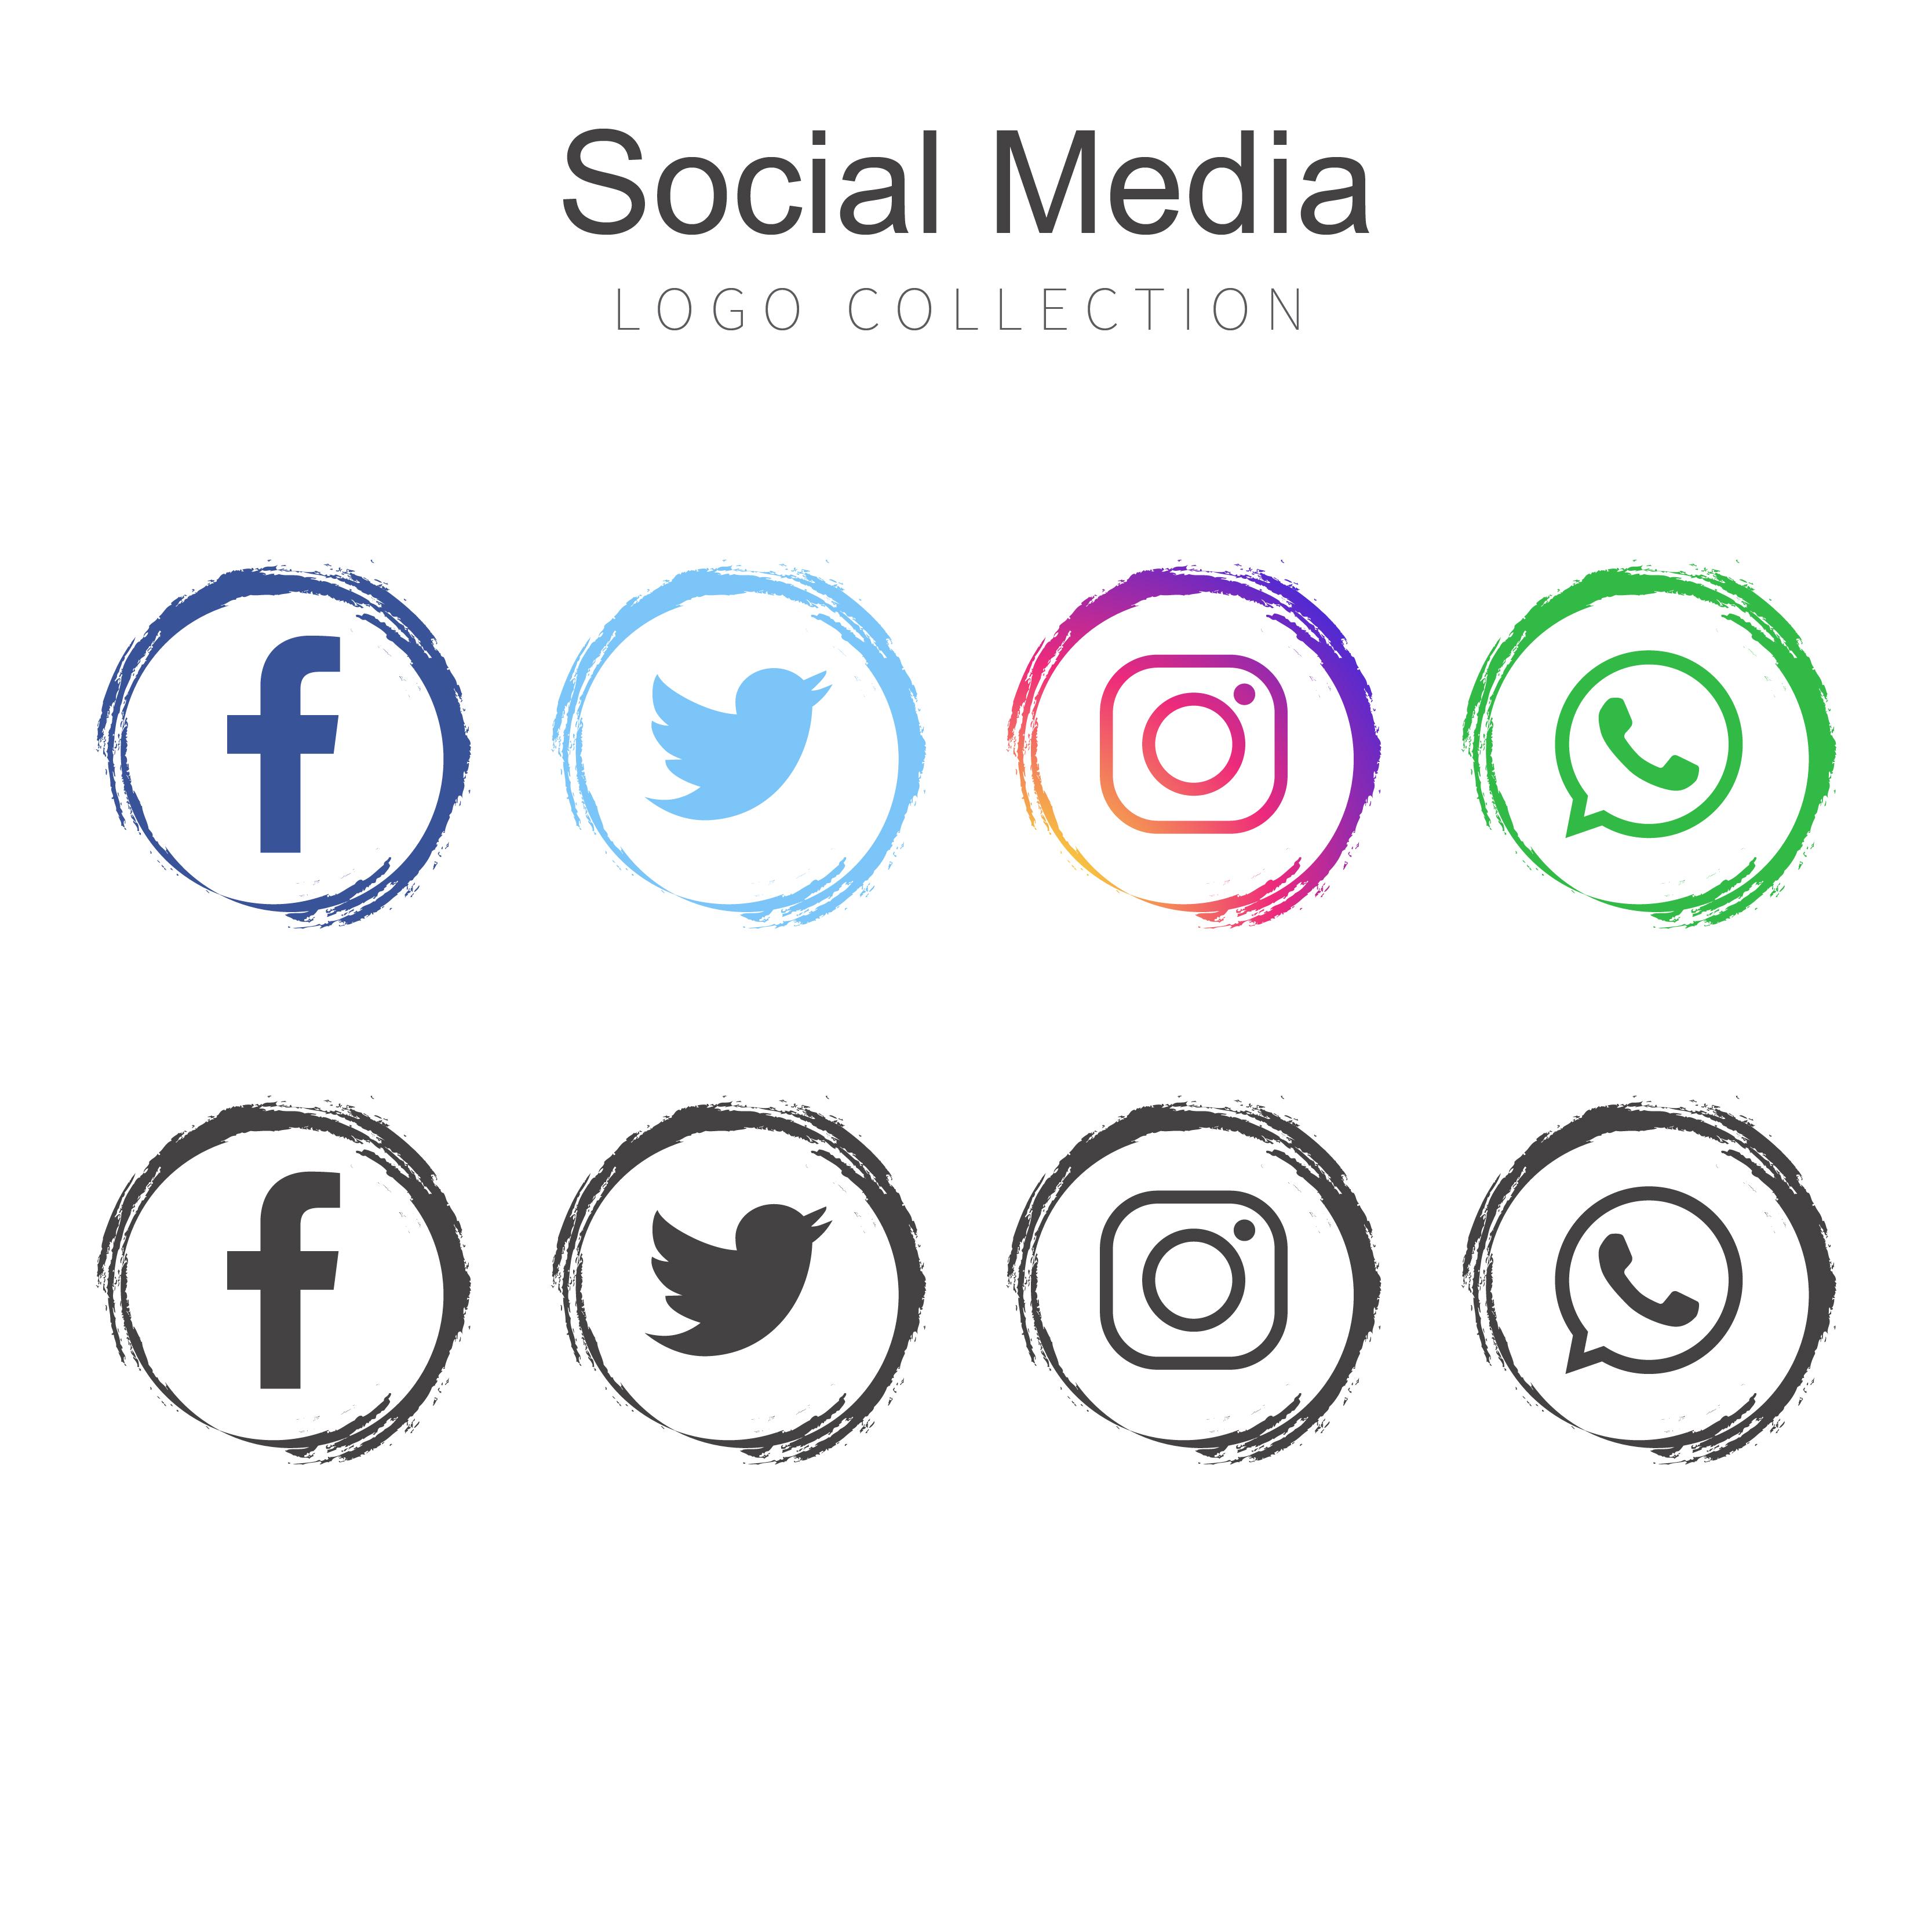 vector-por-social-media-logo-collection Template Application Mobile Free on simple job, editable job, rental home, landlord rental, sample employment, generic job, security employment, printable employment, sample scholarship, for employers,